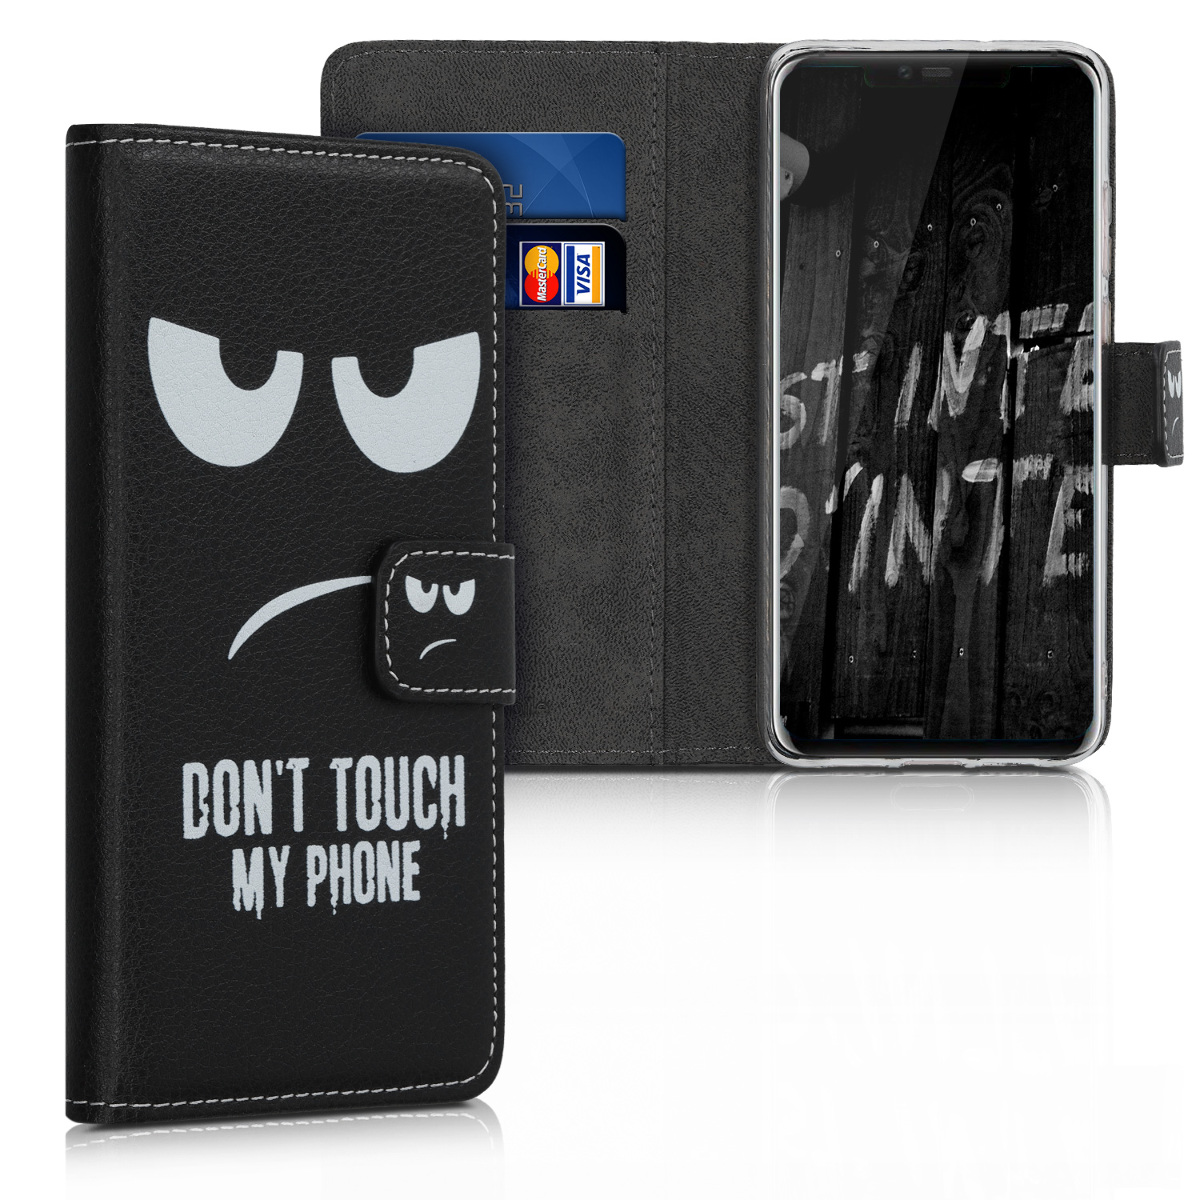 KW Θήκη Πορτοφόλι Huawei Mate 20 Pro - White / Black (48783.01)